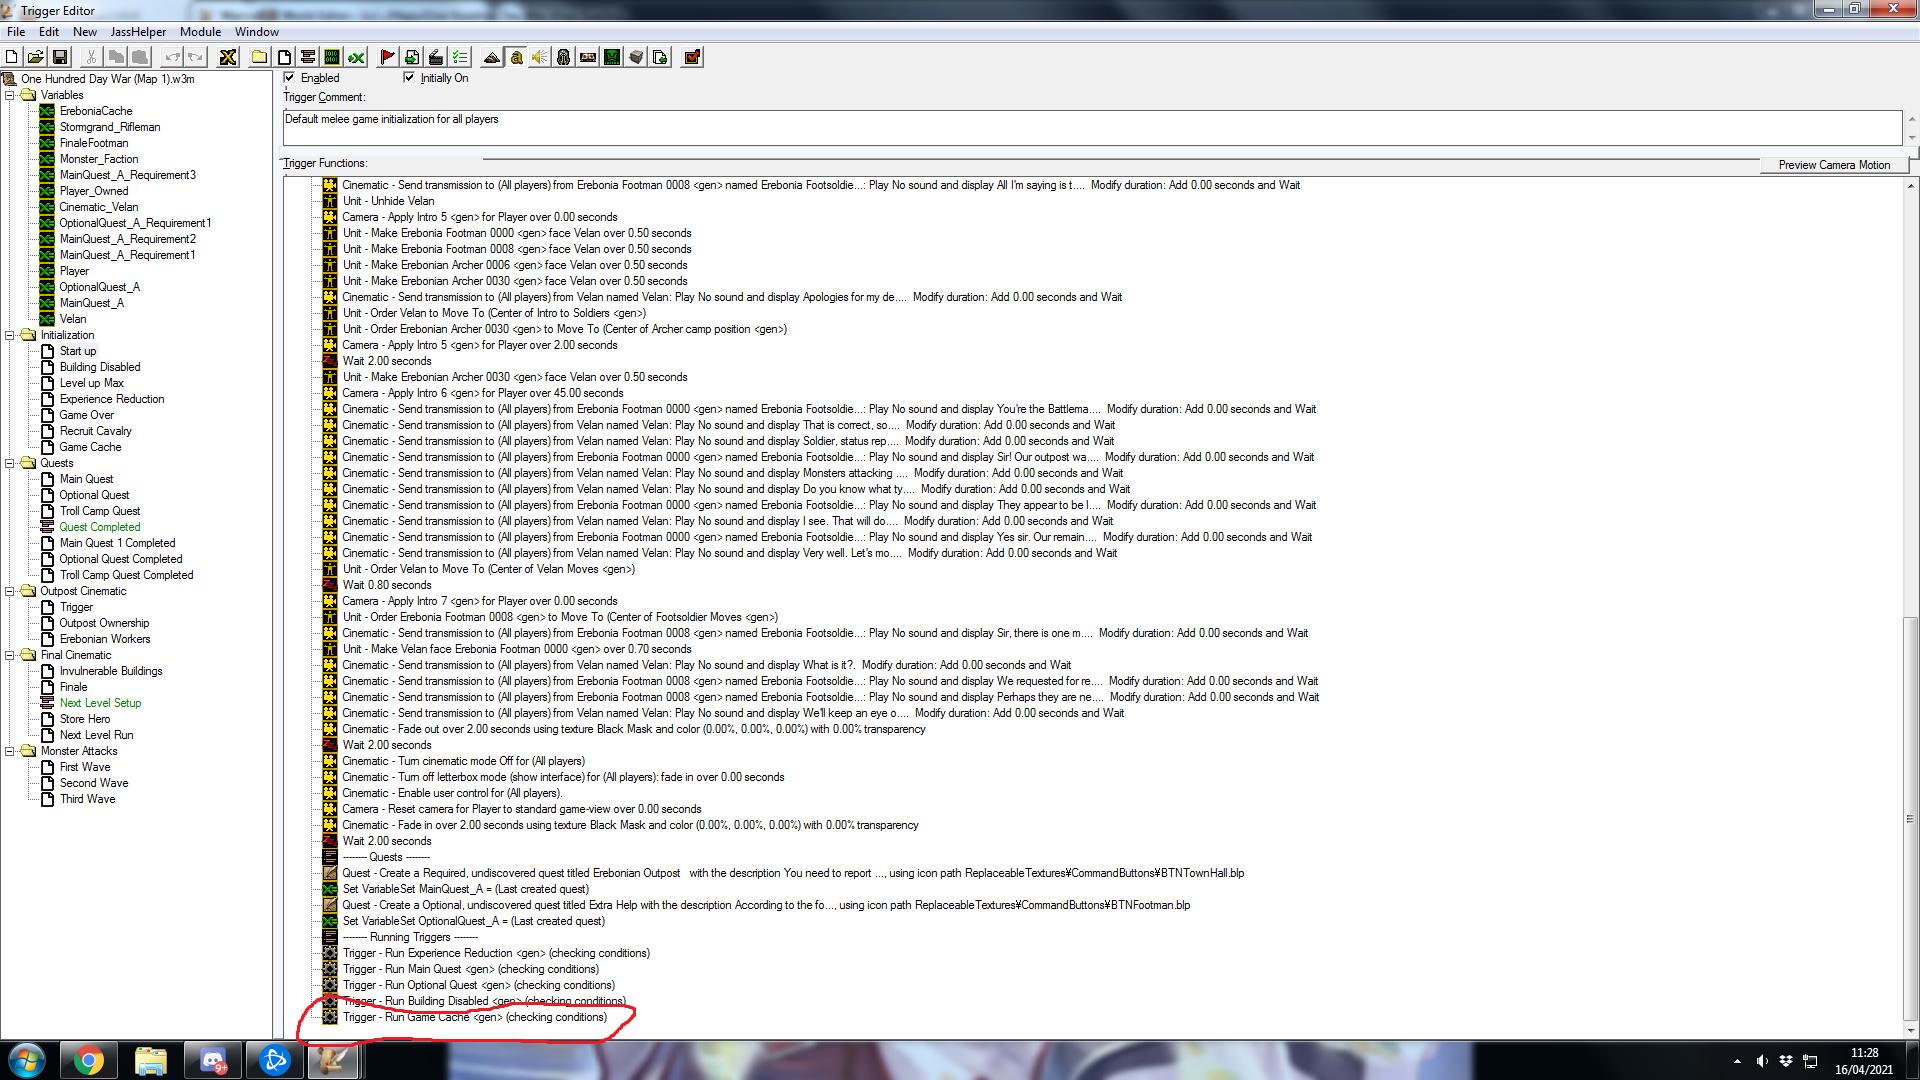 Screenshot 2021-04-16 11.28.47.png